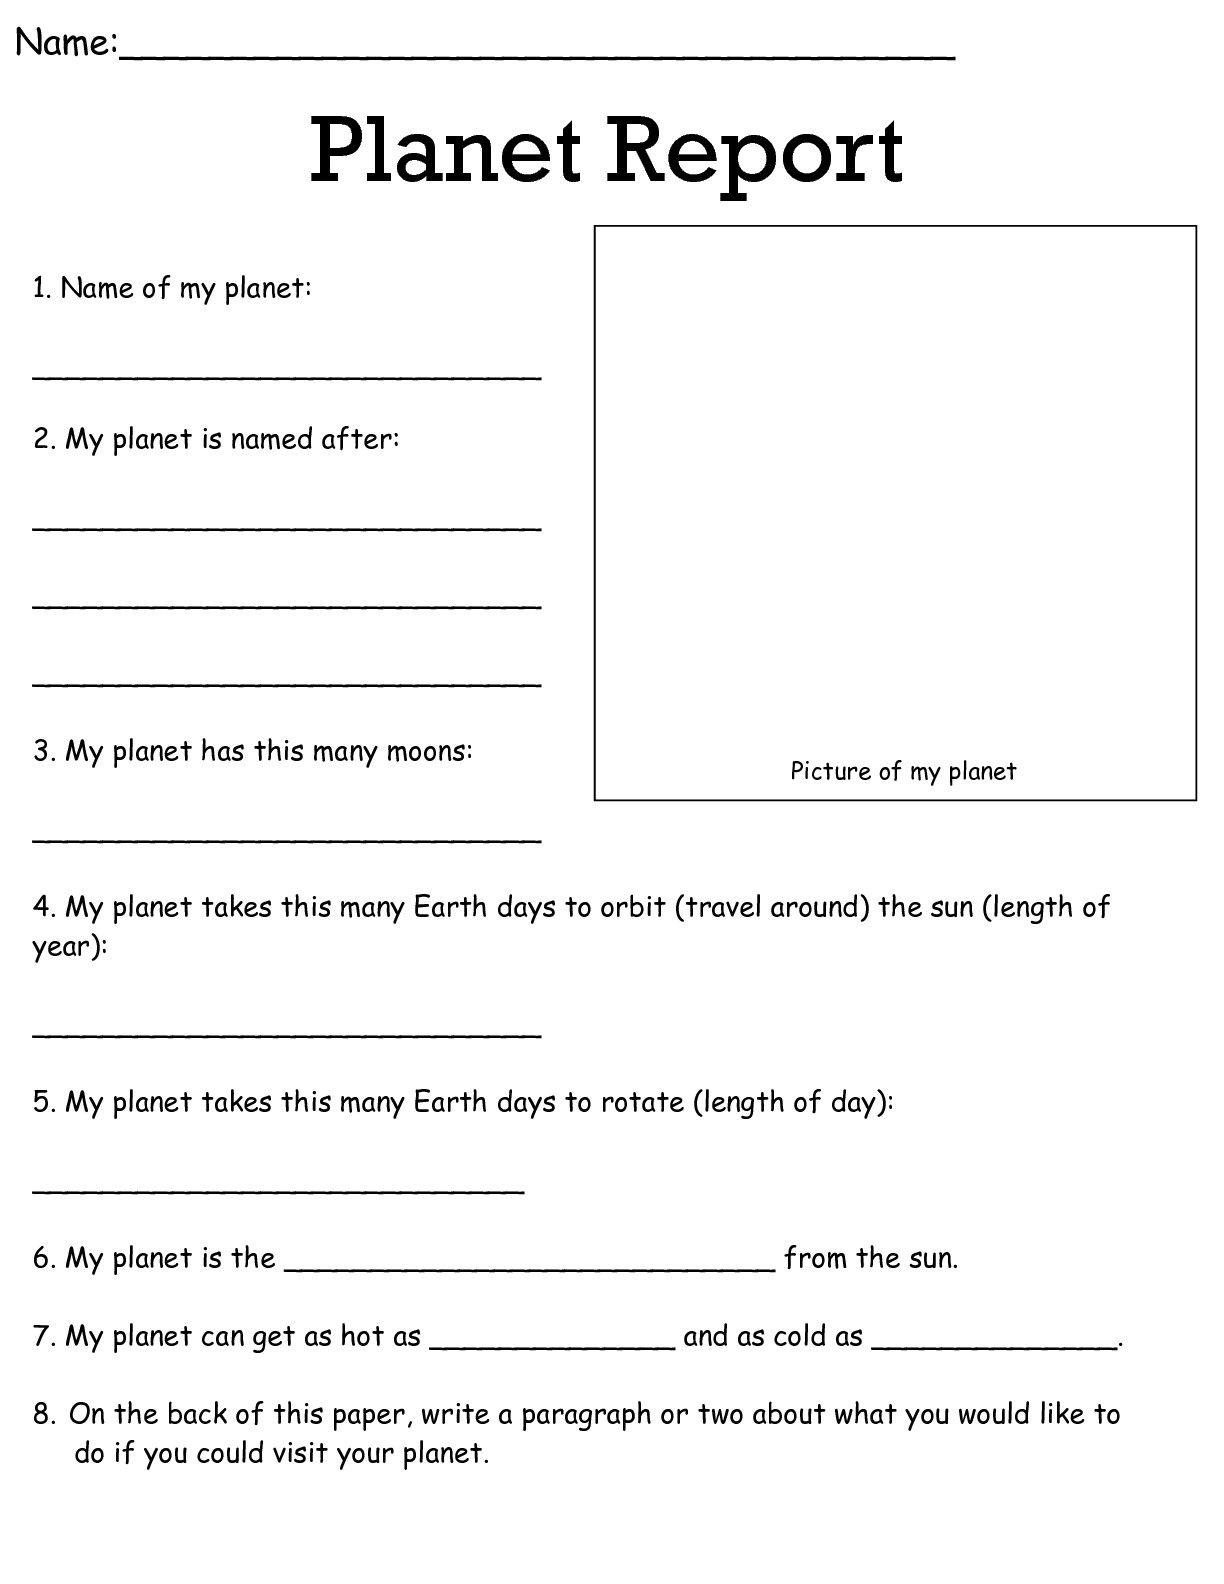 Job Worksheets 5Th &6Th | Science Worksheets Science Worksheets | Free Printable Fifth Grade Science Worksheets